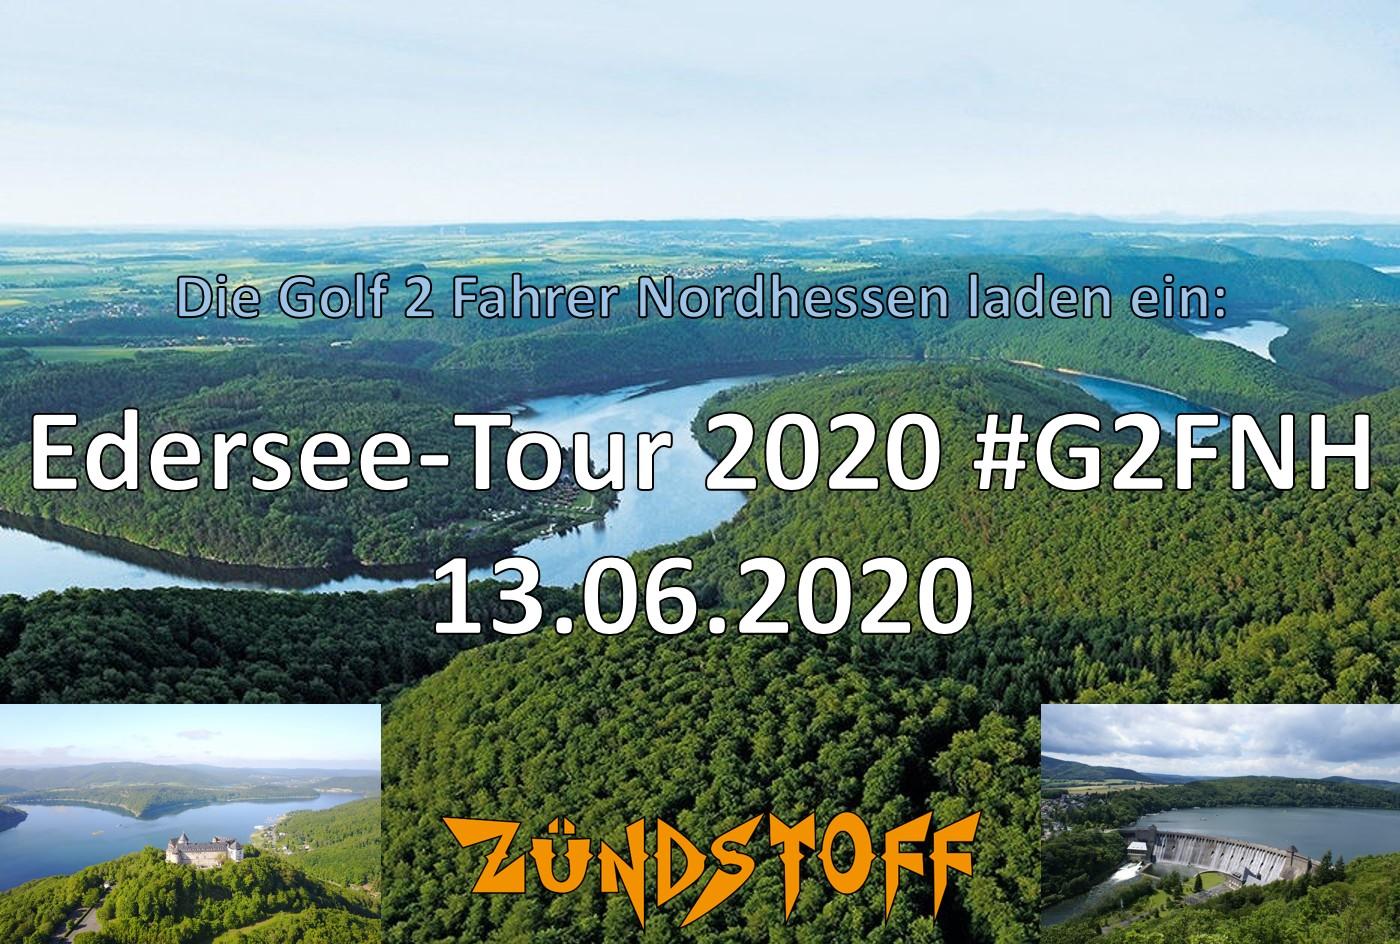 Einladung_Edersee-Tour_2020_G2FNH.jpg